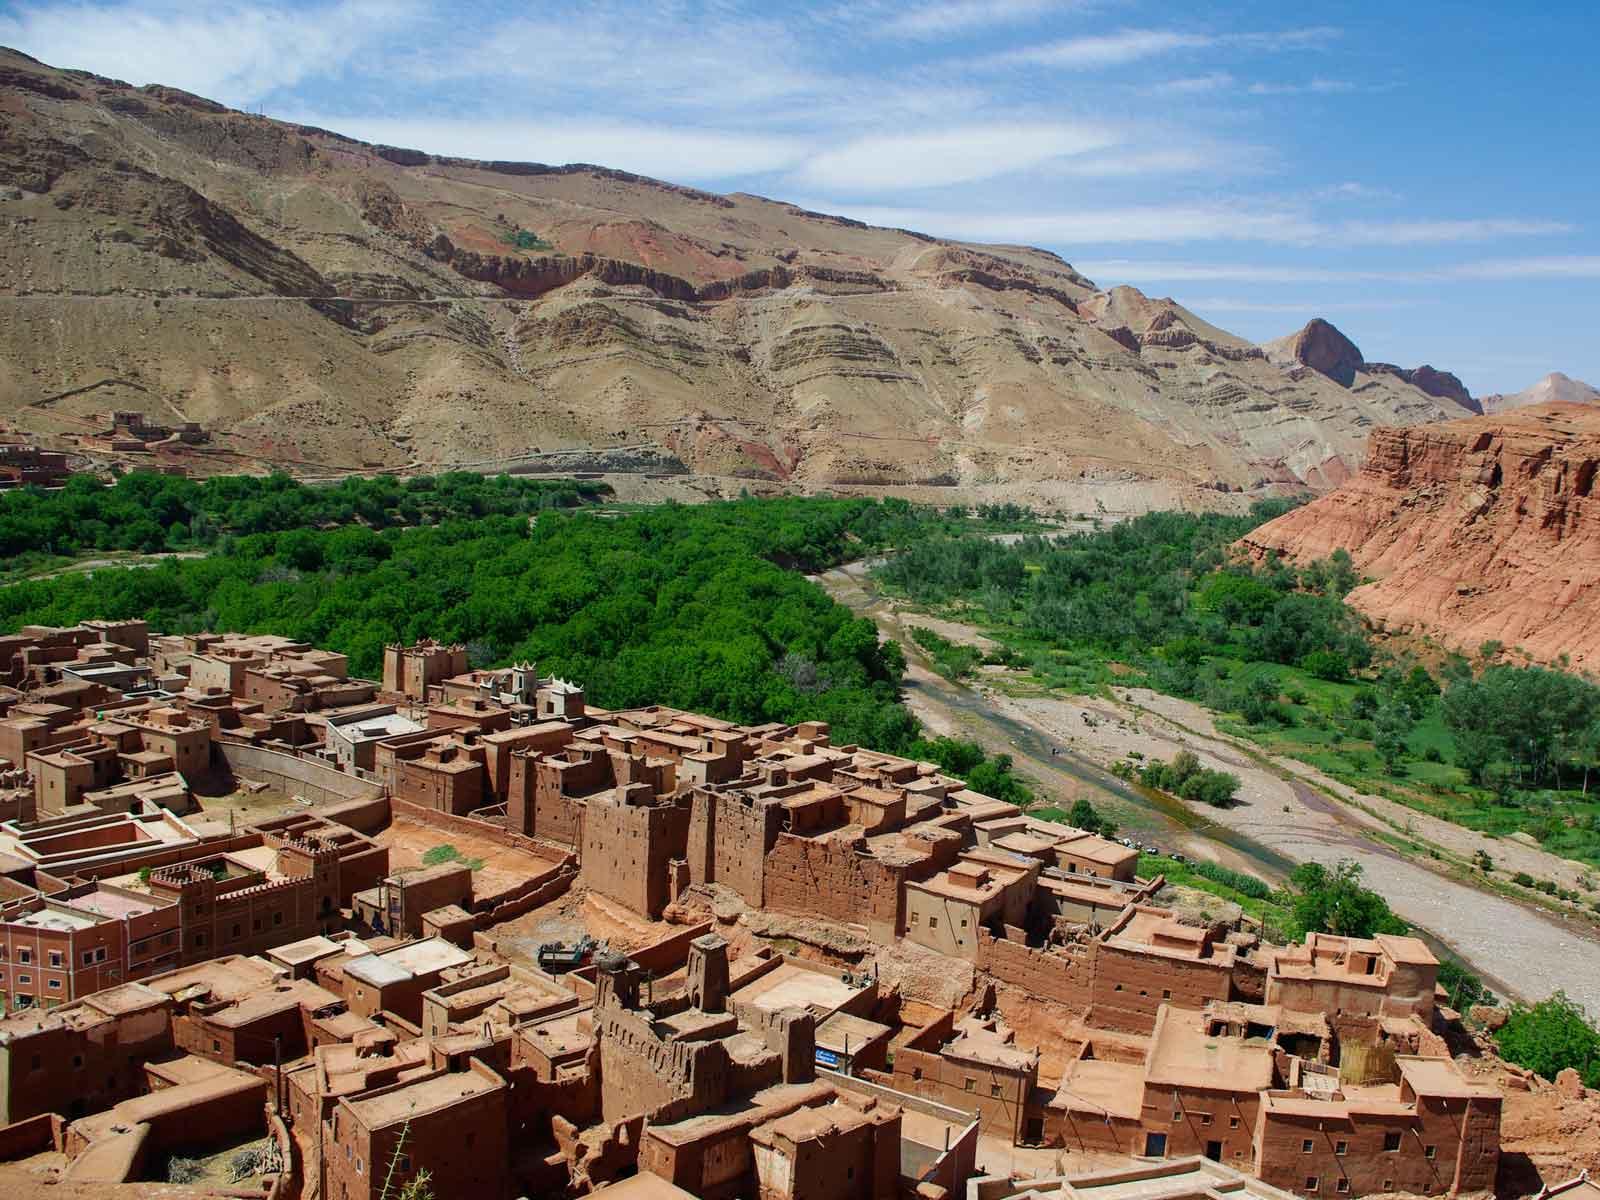 Marrakech 2 day desert tour to zagora